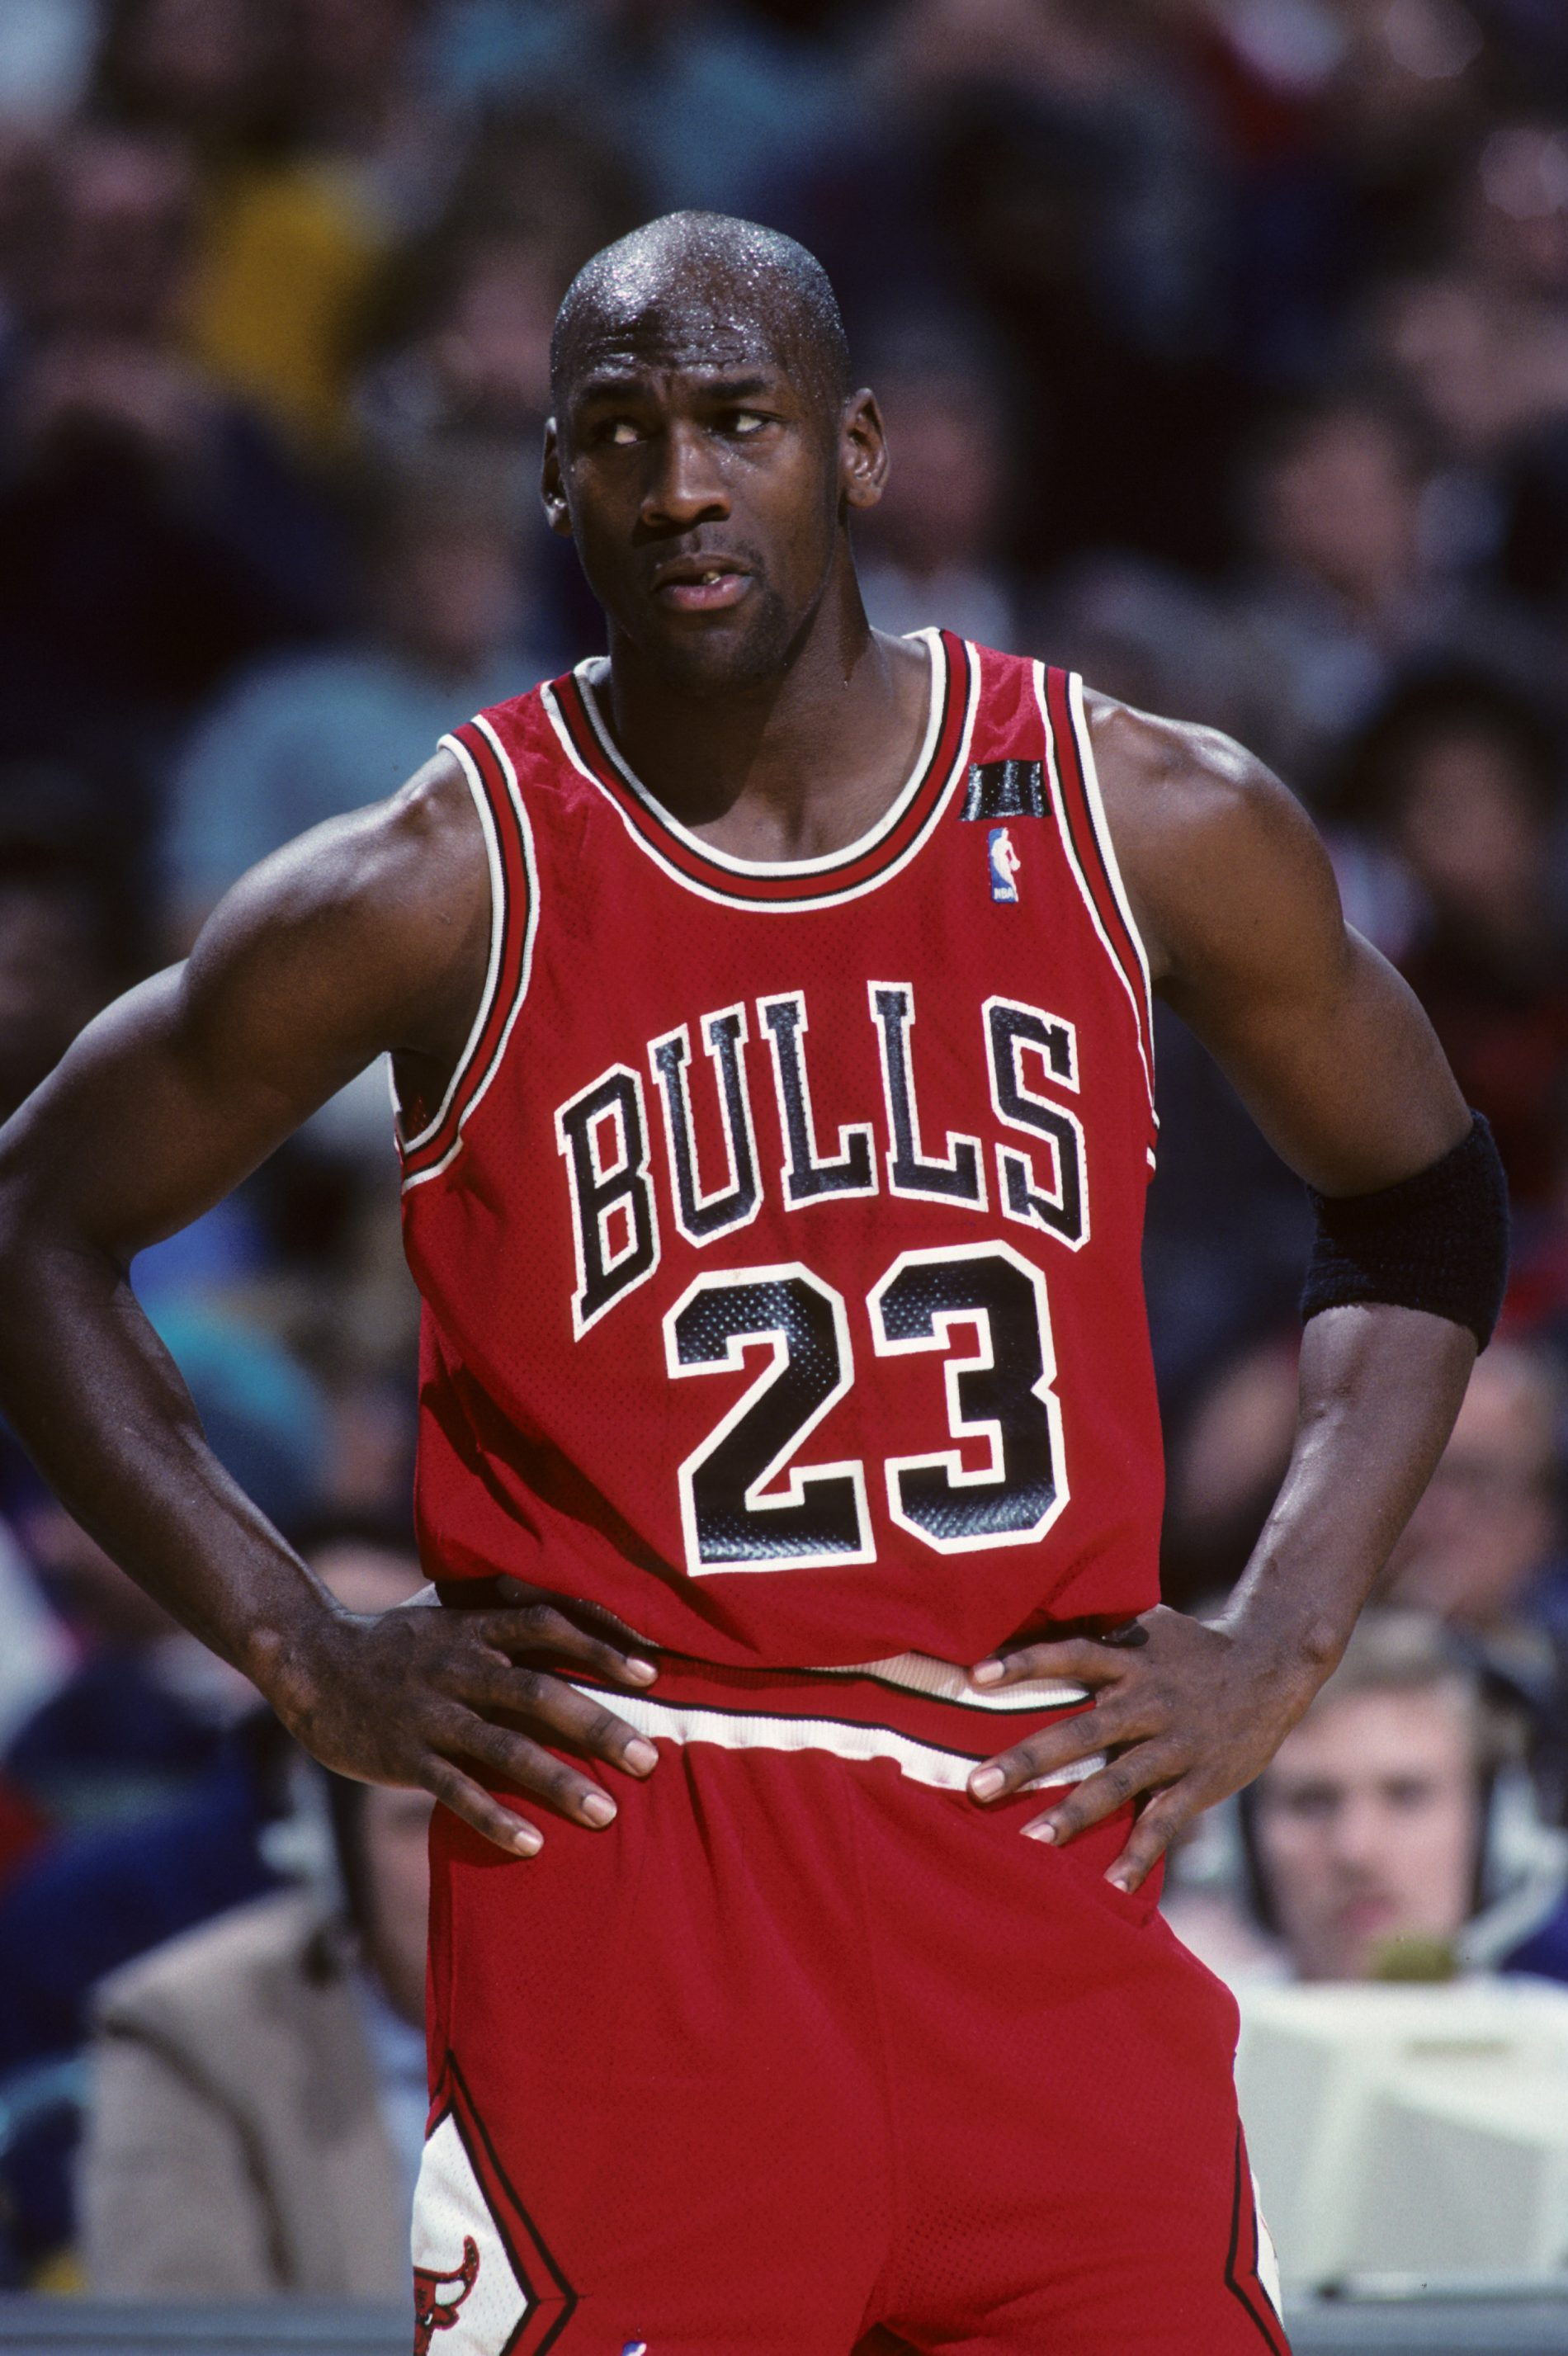 Michael Jordan Hall of Fame player for the Chicago Bulls